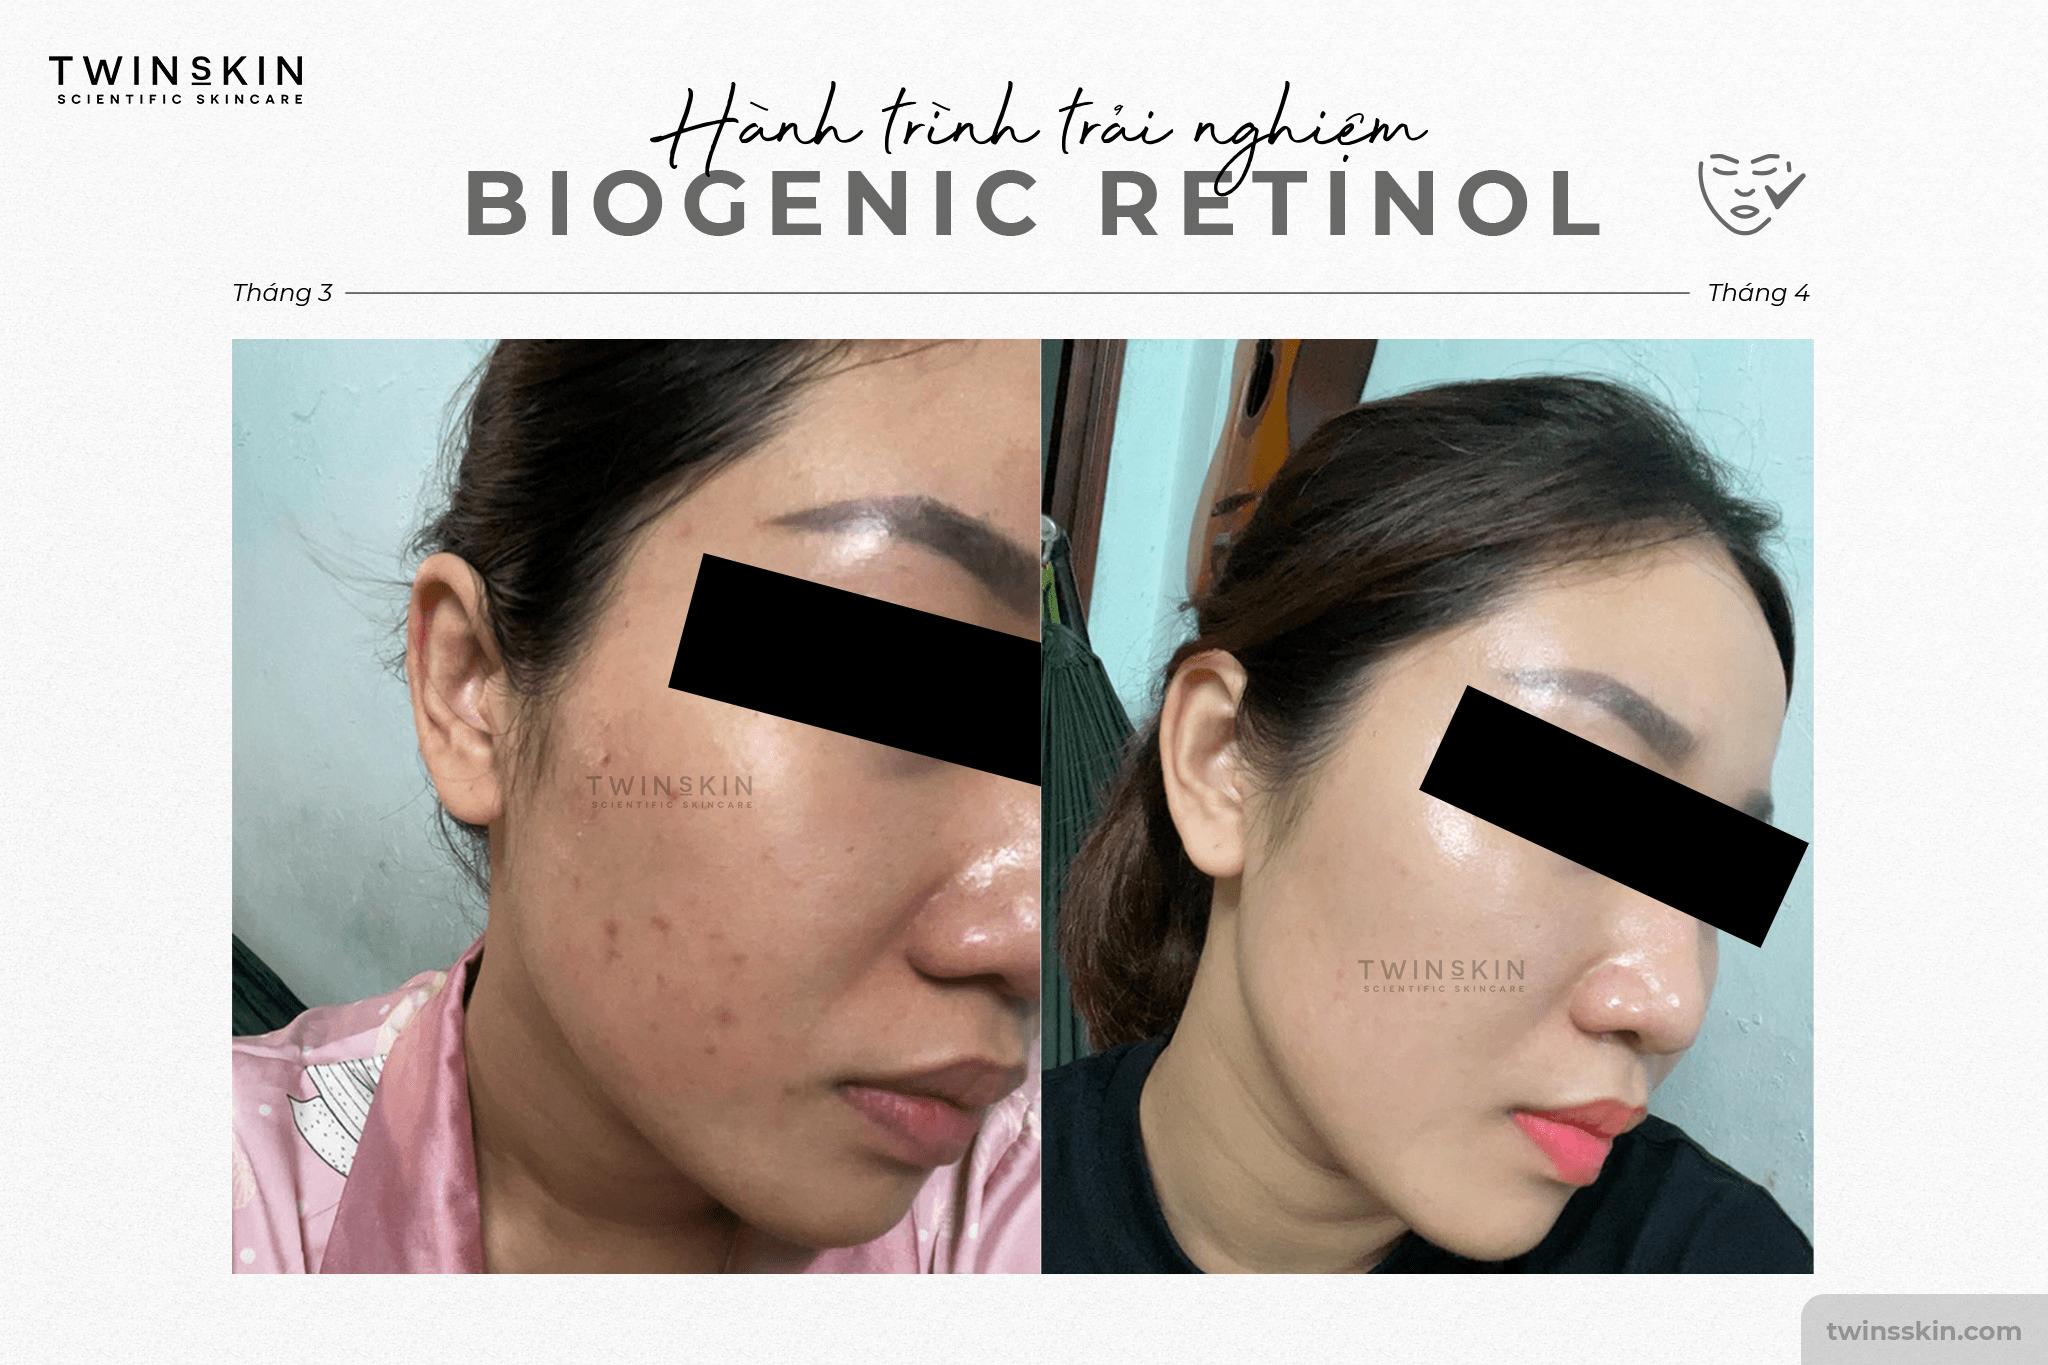 retinol twins skin review